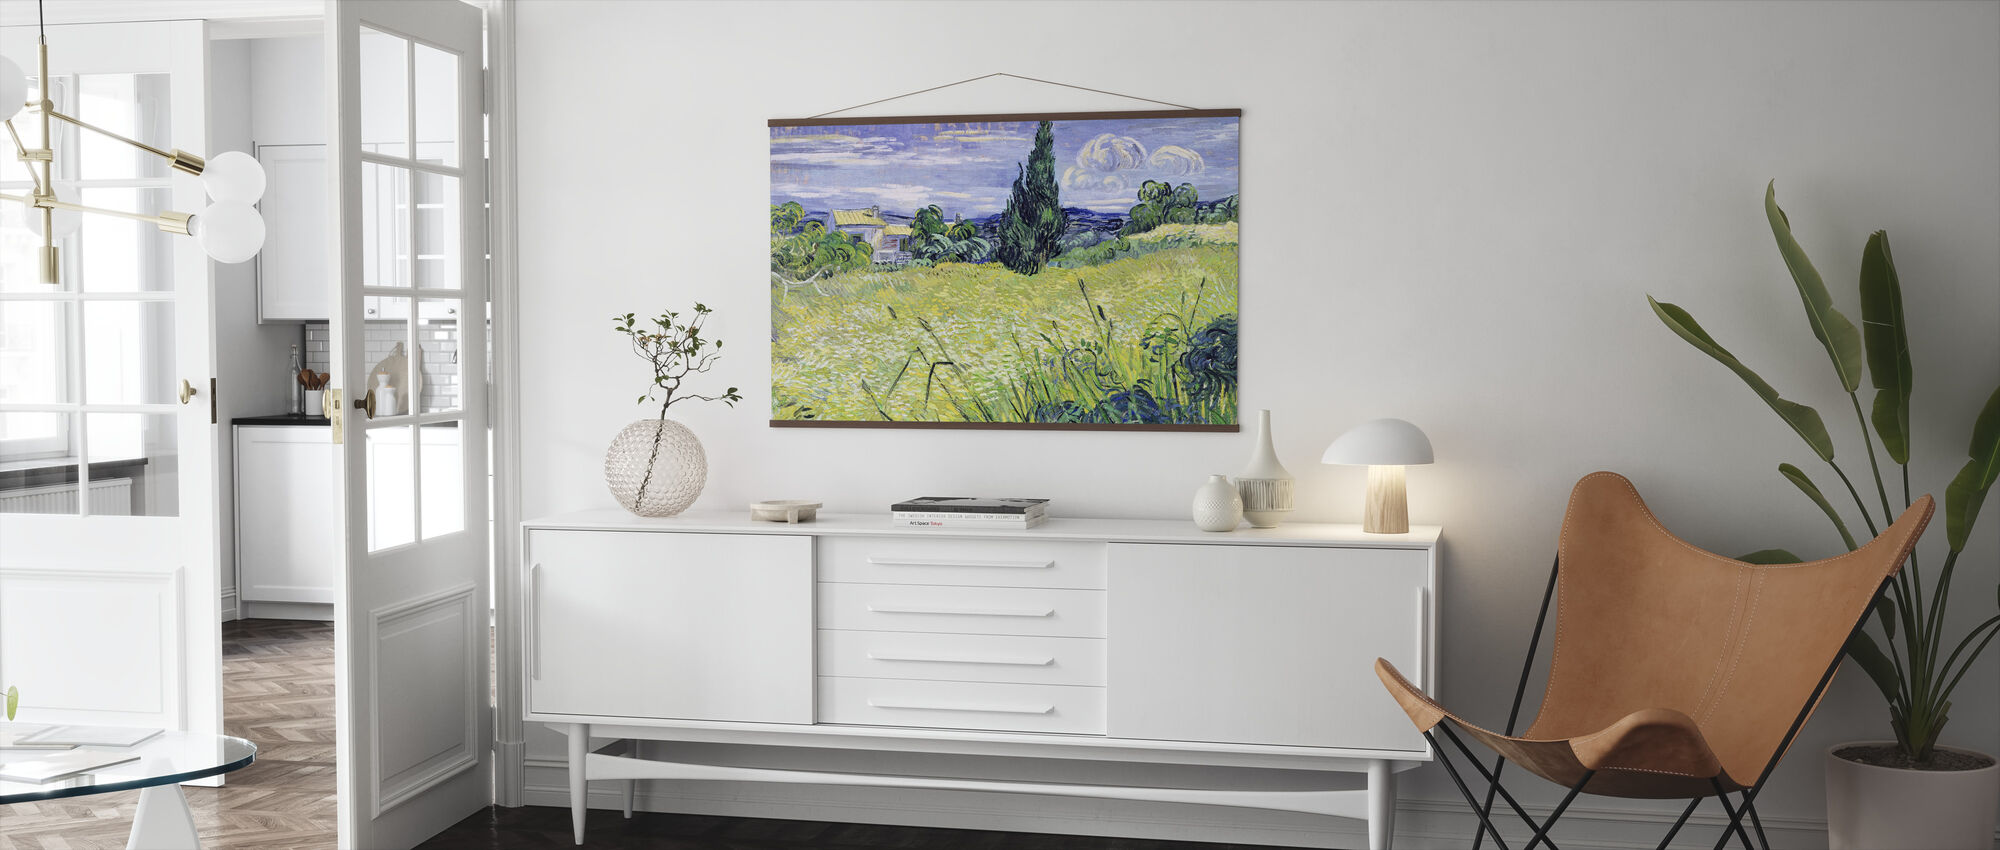 Veld, Vincent van Gogh - Poster - Woonkamer